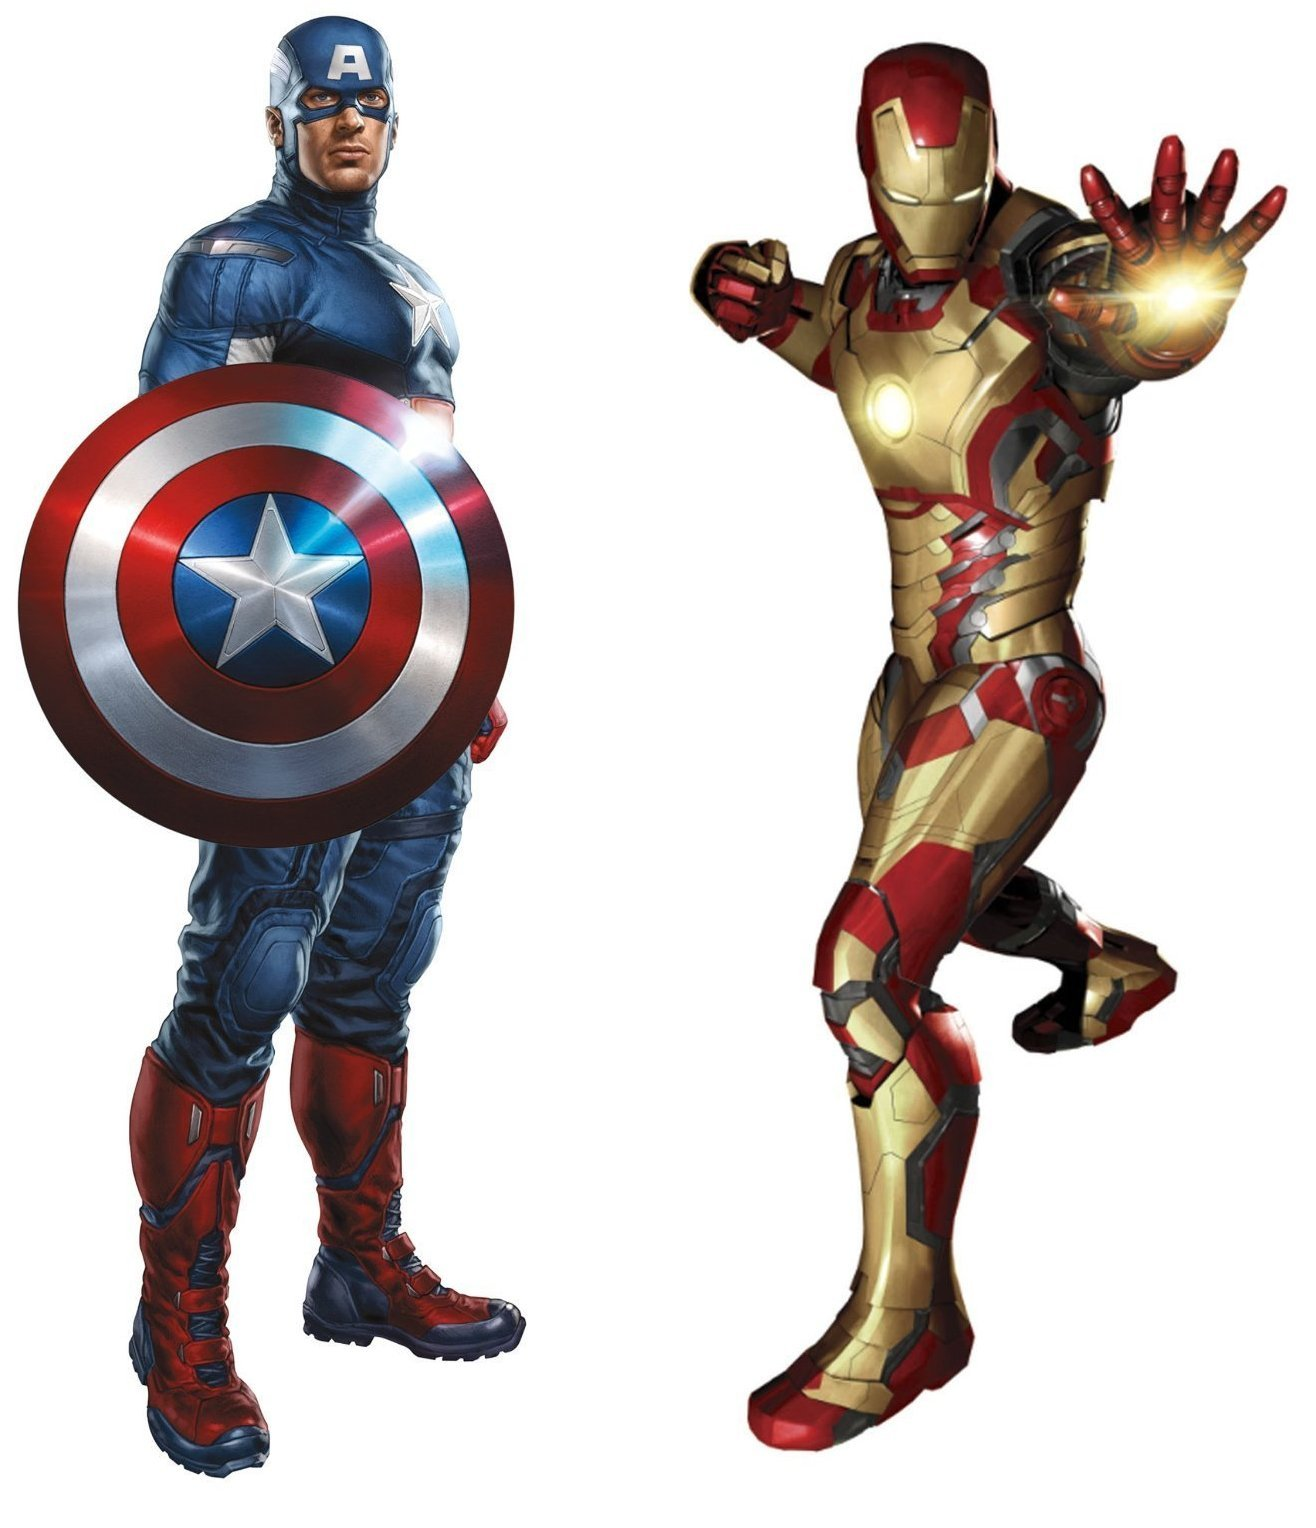 Marvel Superheroes Avengers Comic - Civil Wars - Captain America vs Iron-Man Giant Wall Decal Sticker bundle by Civil War